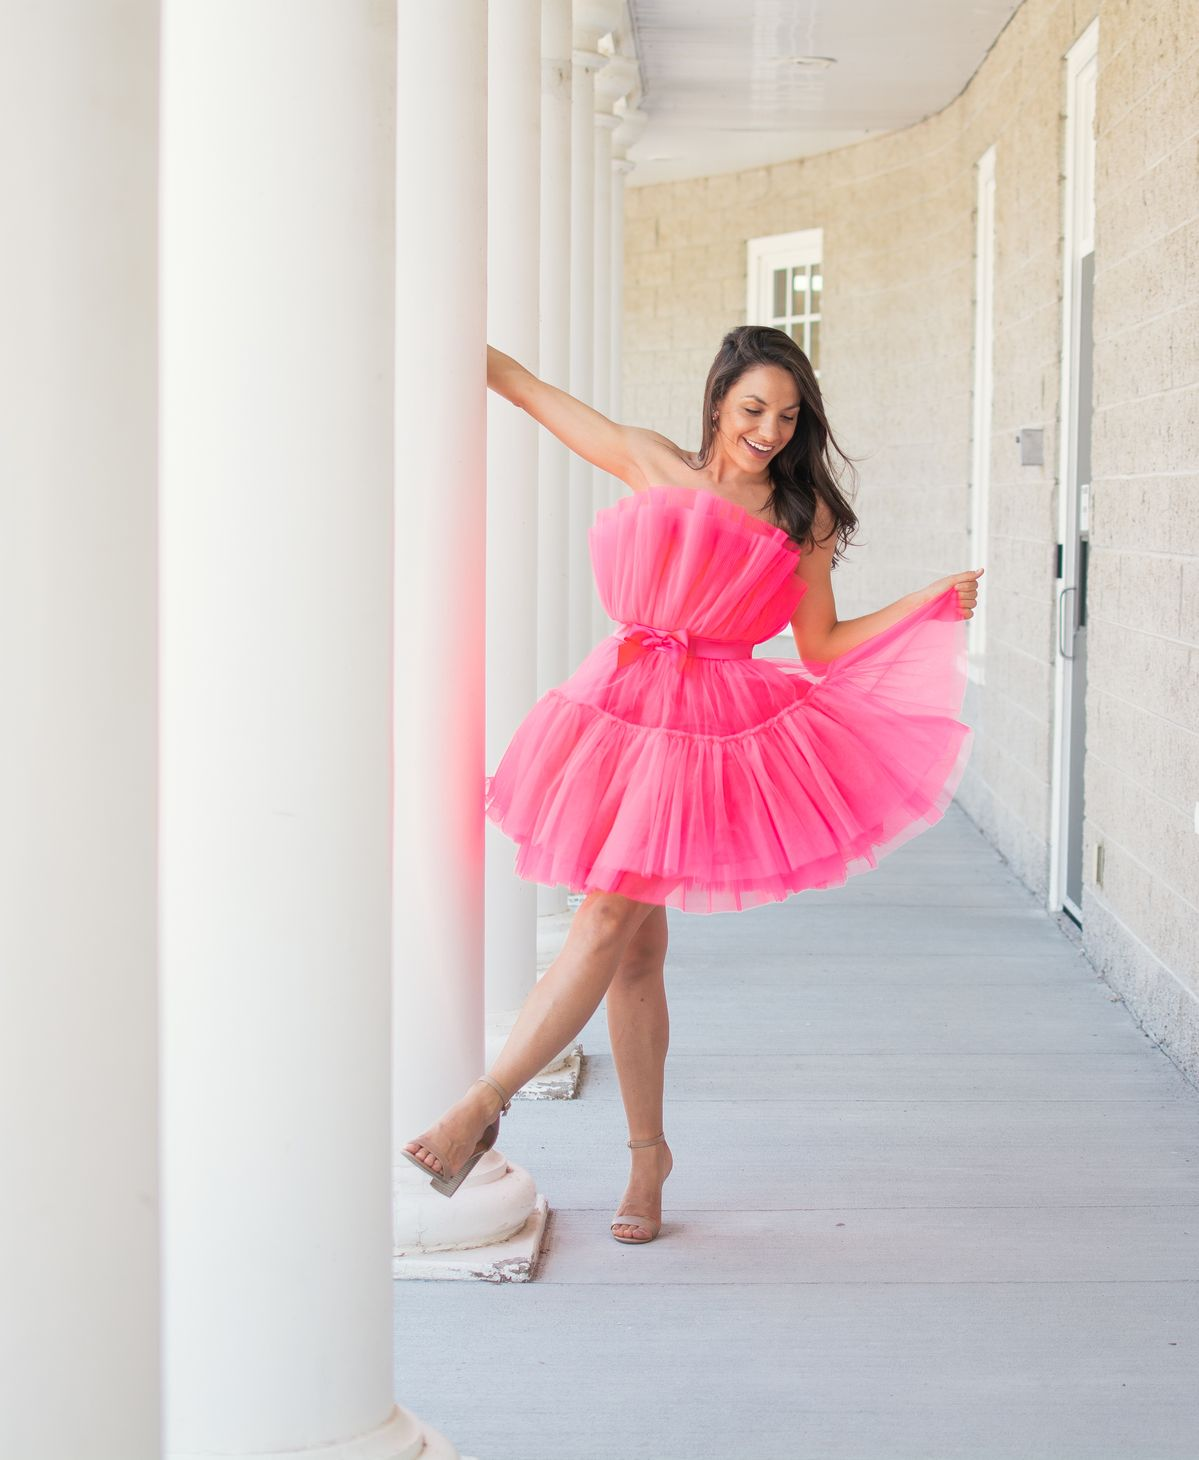 Barbie Inspired Dream Dress | The Pink Brunette